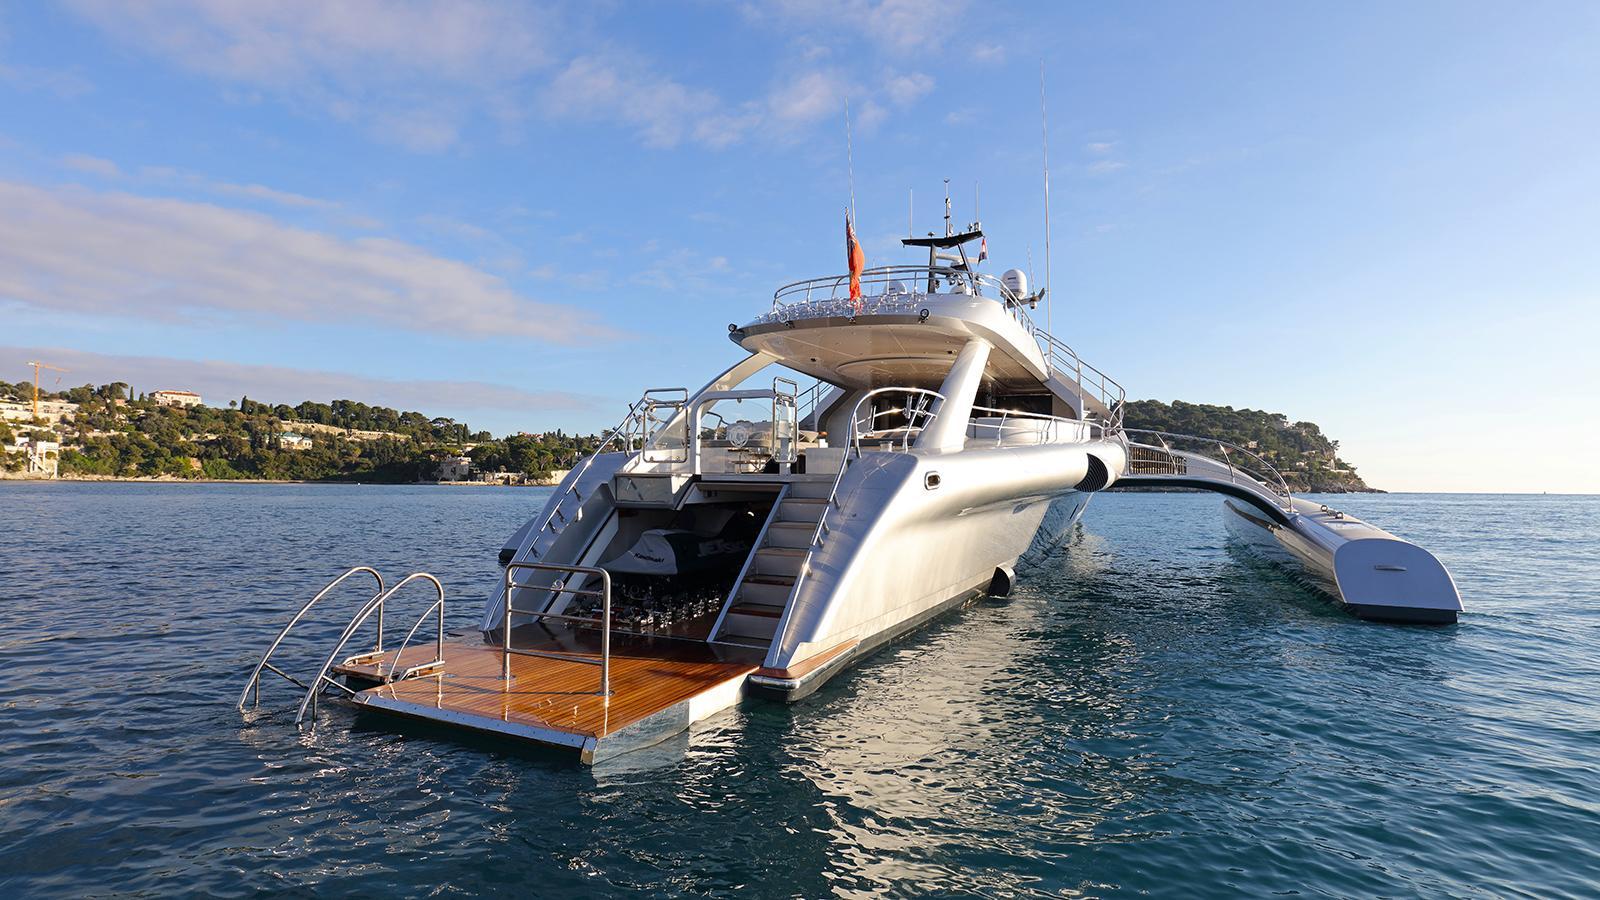 galaxy of happiness trimaran yacht latitude 2016 53m bathing platform